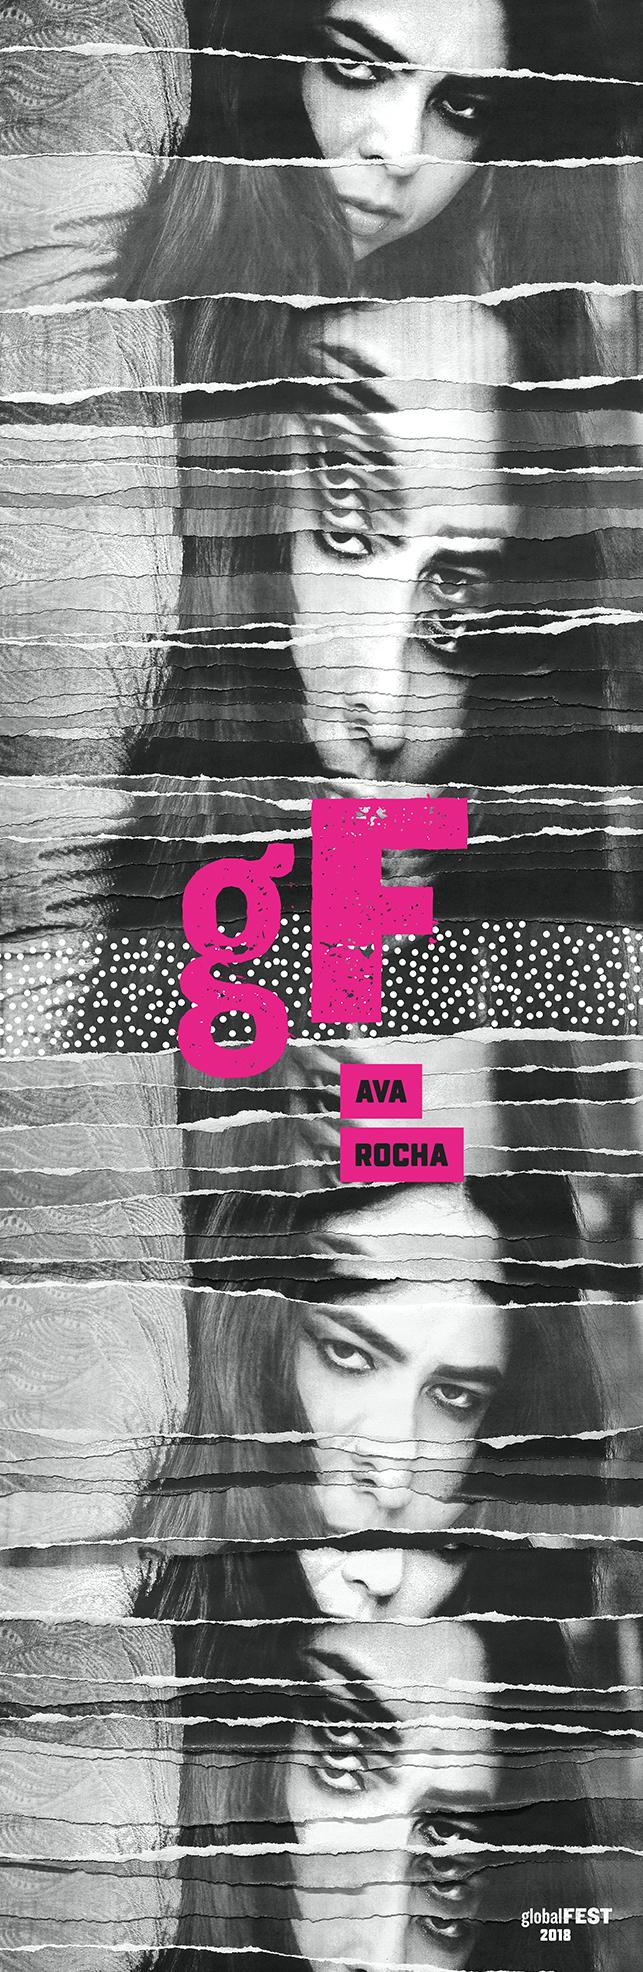 diogomontes_globalfest_artist_posters-ava